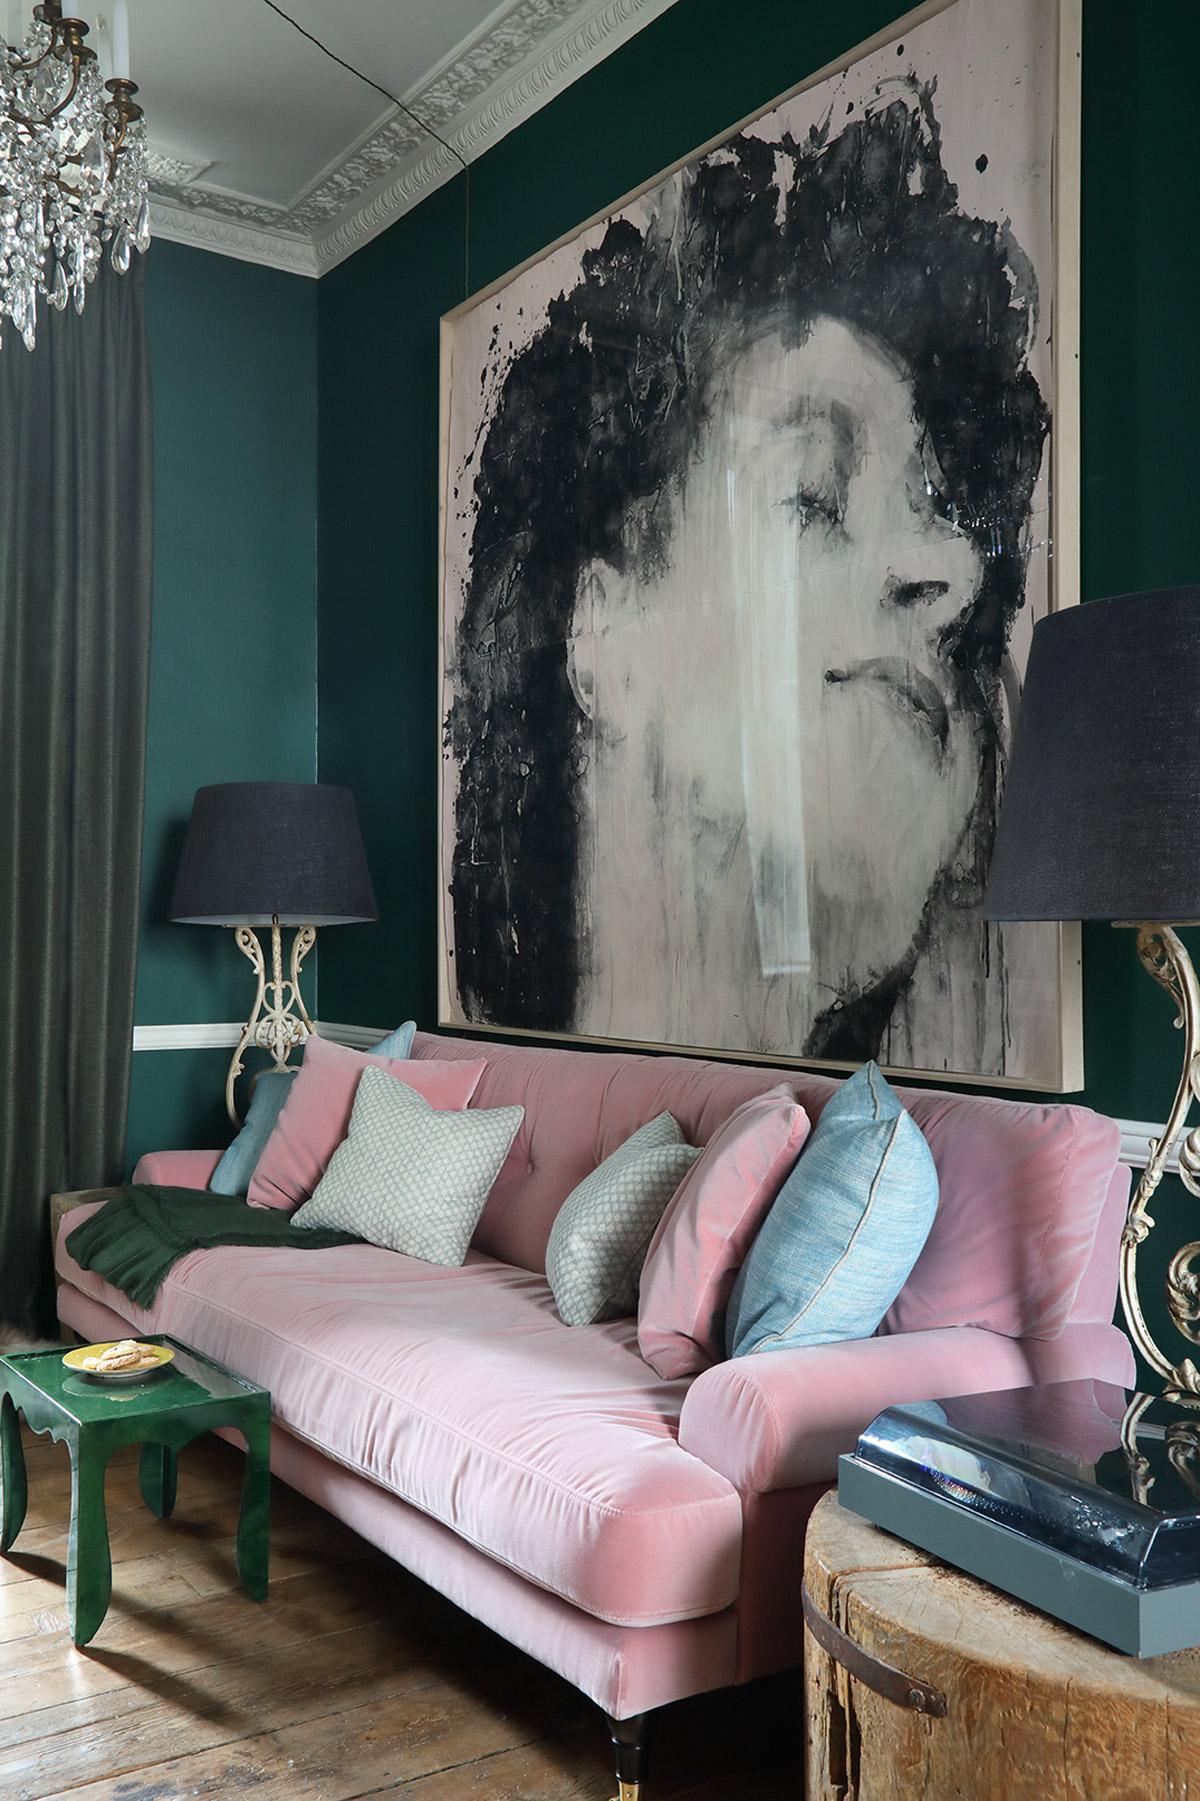 Interior designer, Ana Engelhorn project image of living room interior with pink sofa